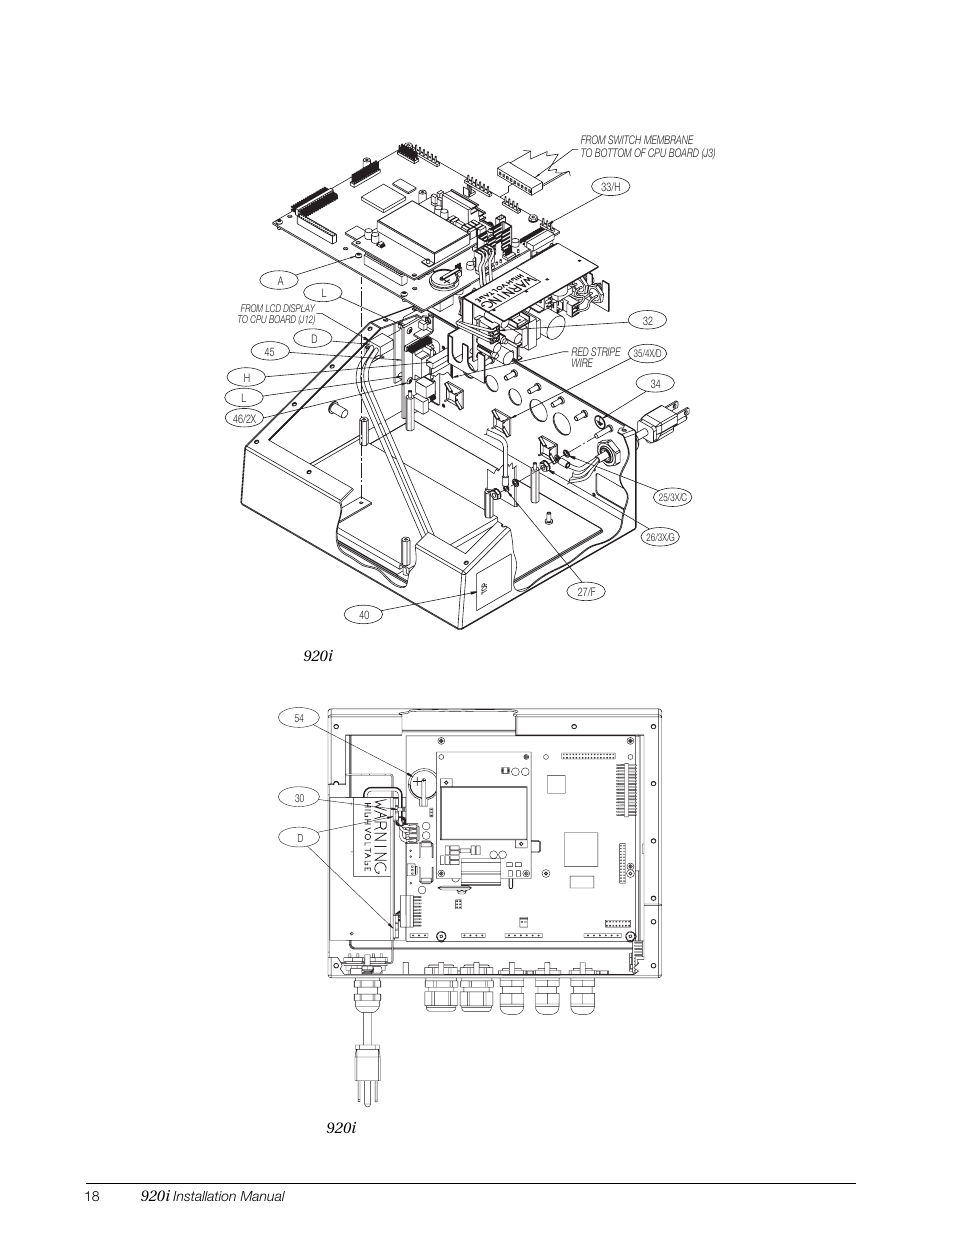 Rice Lake 920i Installation Manual V3.07 User Manual